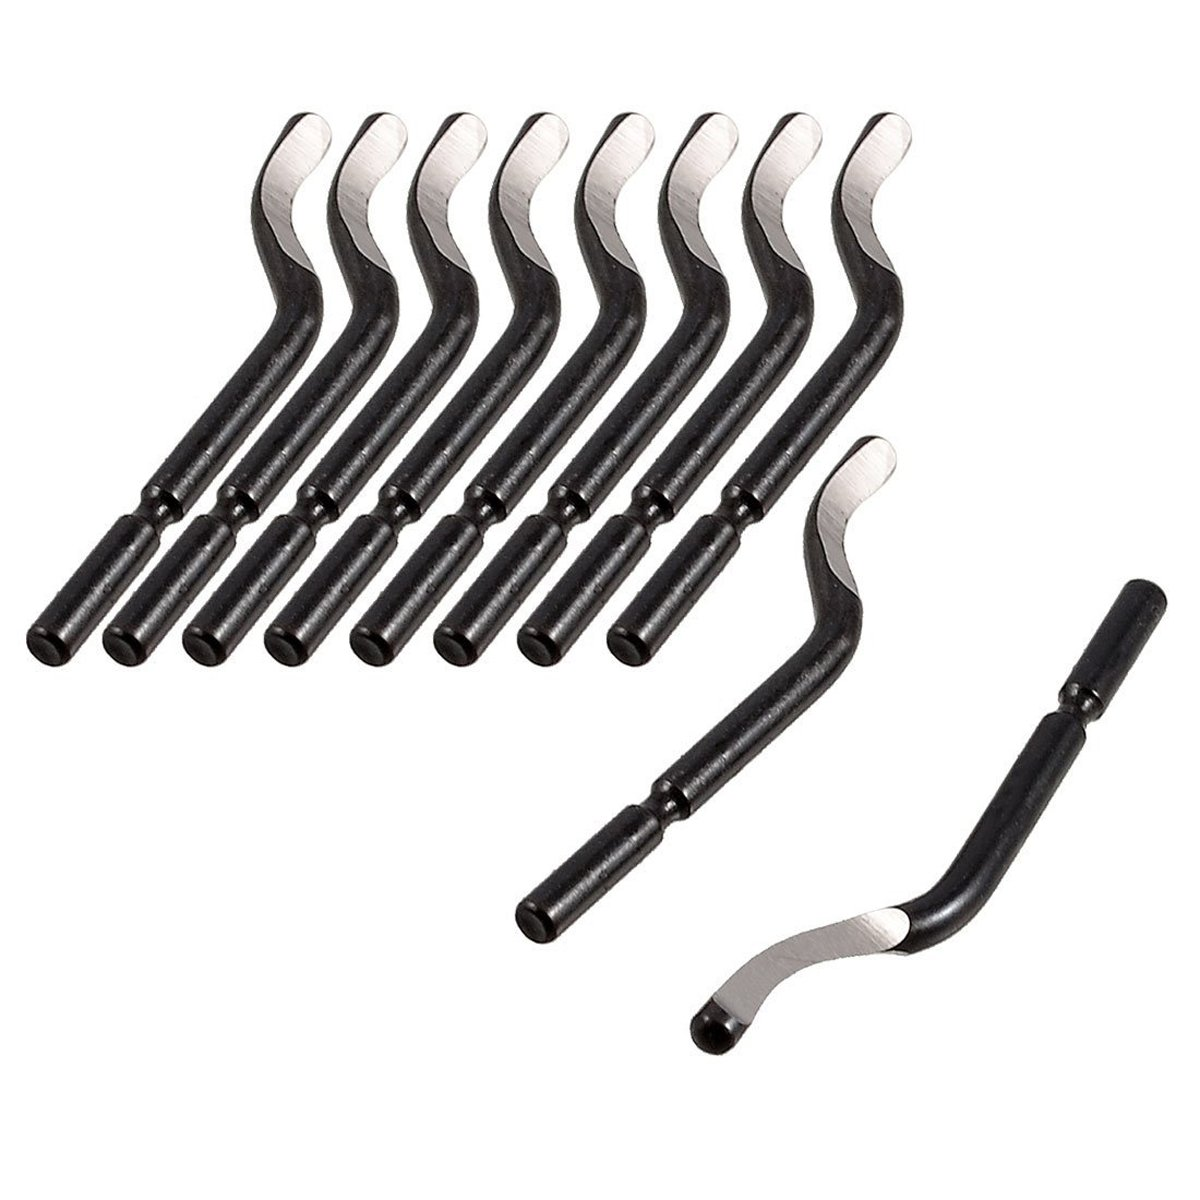 10-Piece YXQ BS1010 S10 Repair Part Deburred Tool Deburring Blades